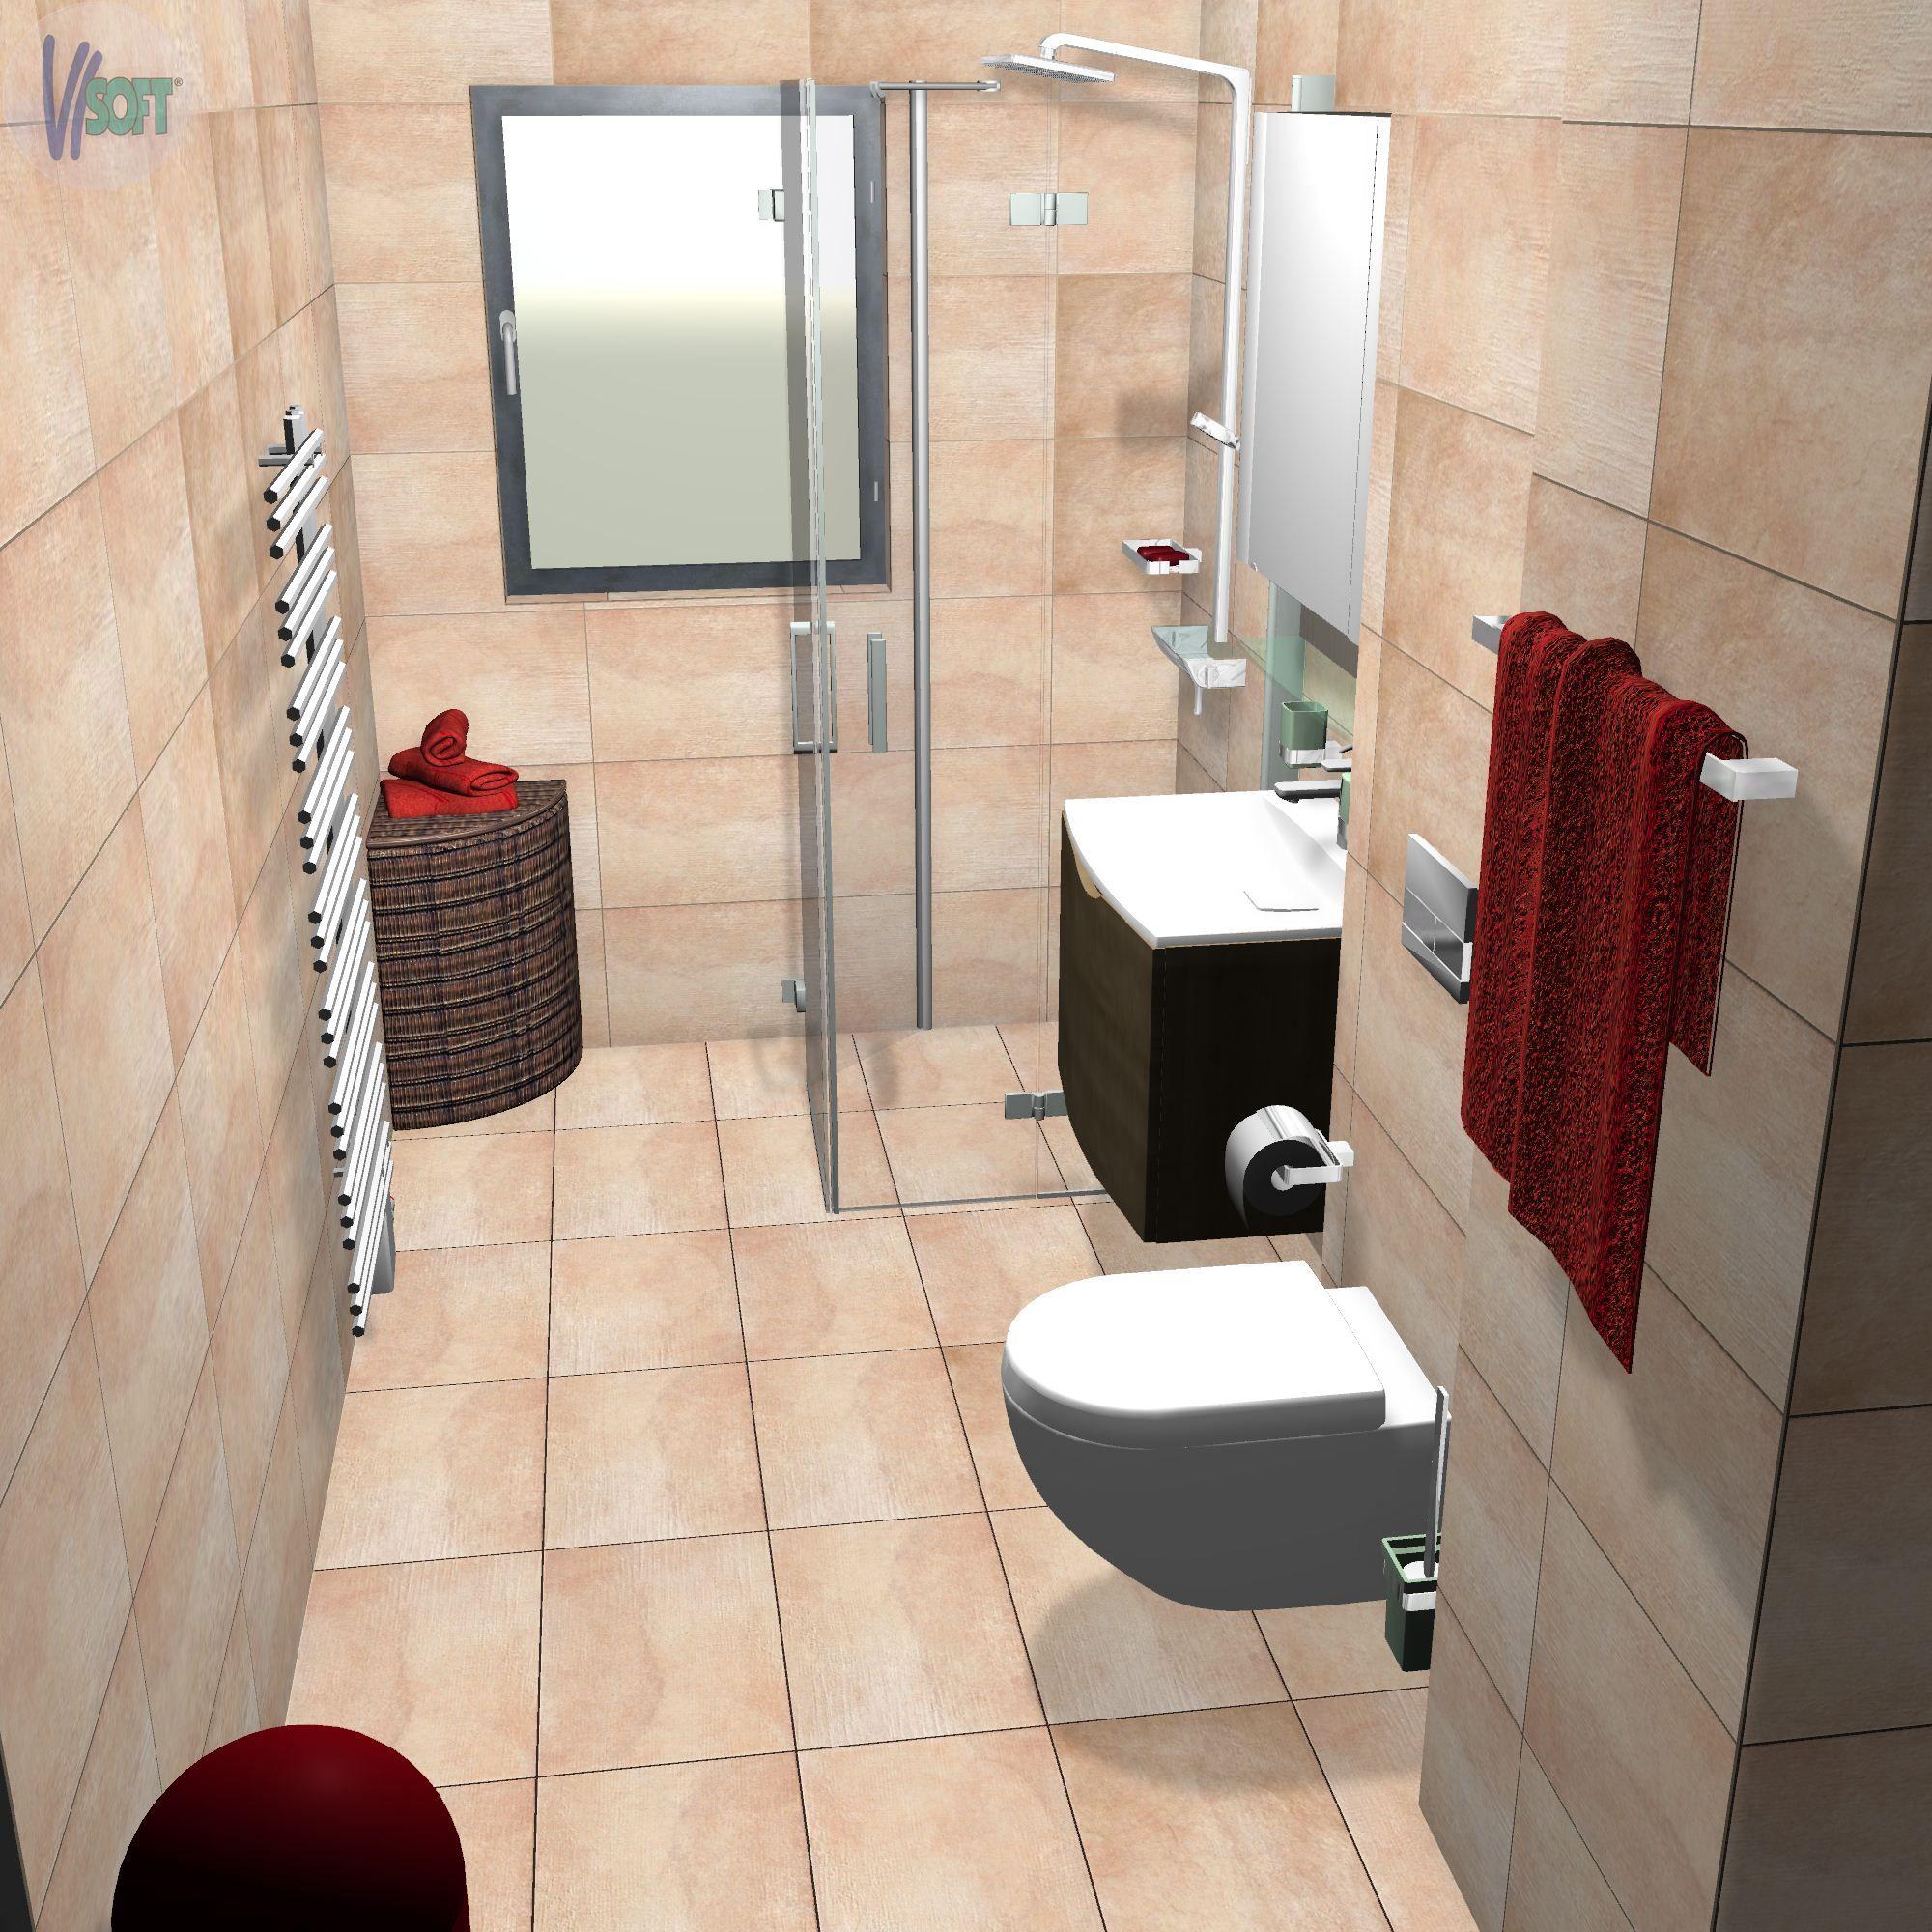 neues badezimmer planen. Black Bedroom Furniture Sets. Home Design Ideas